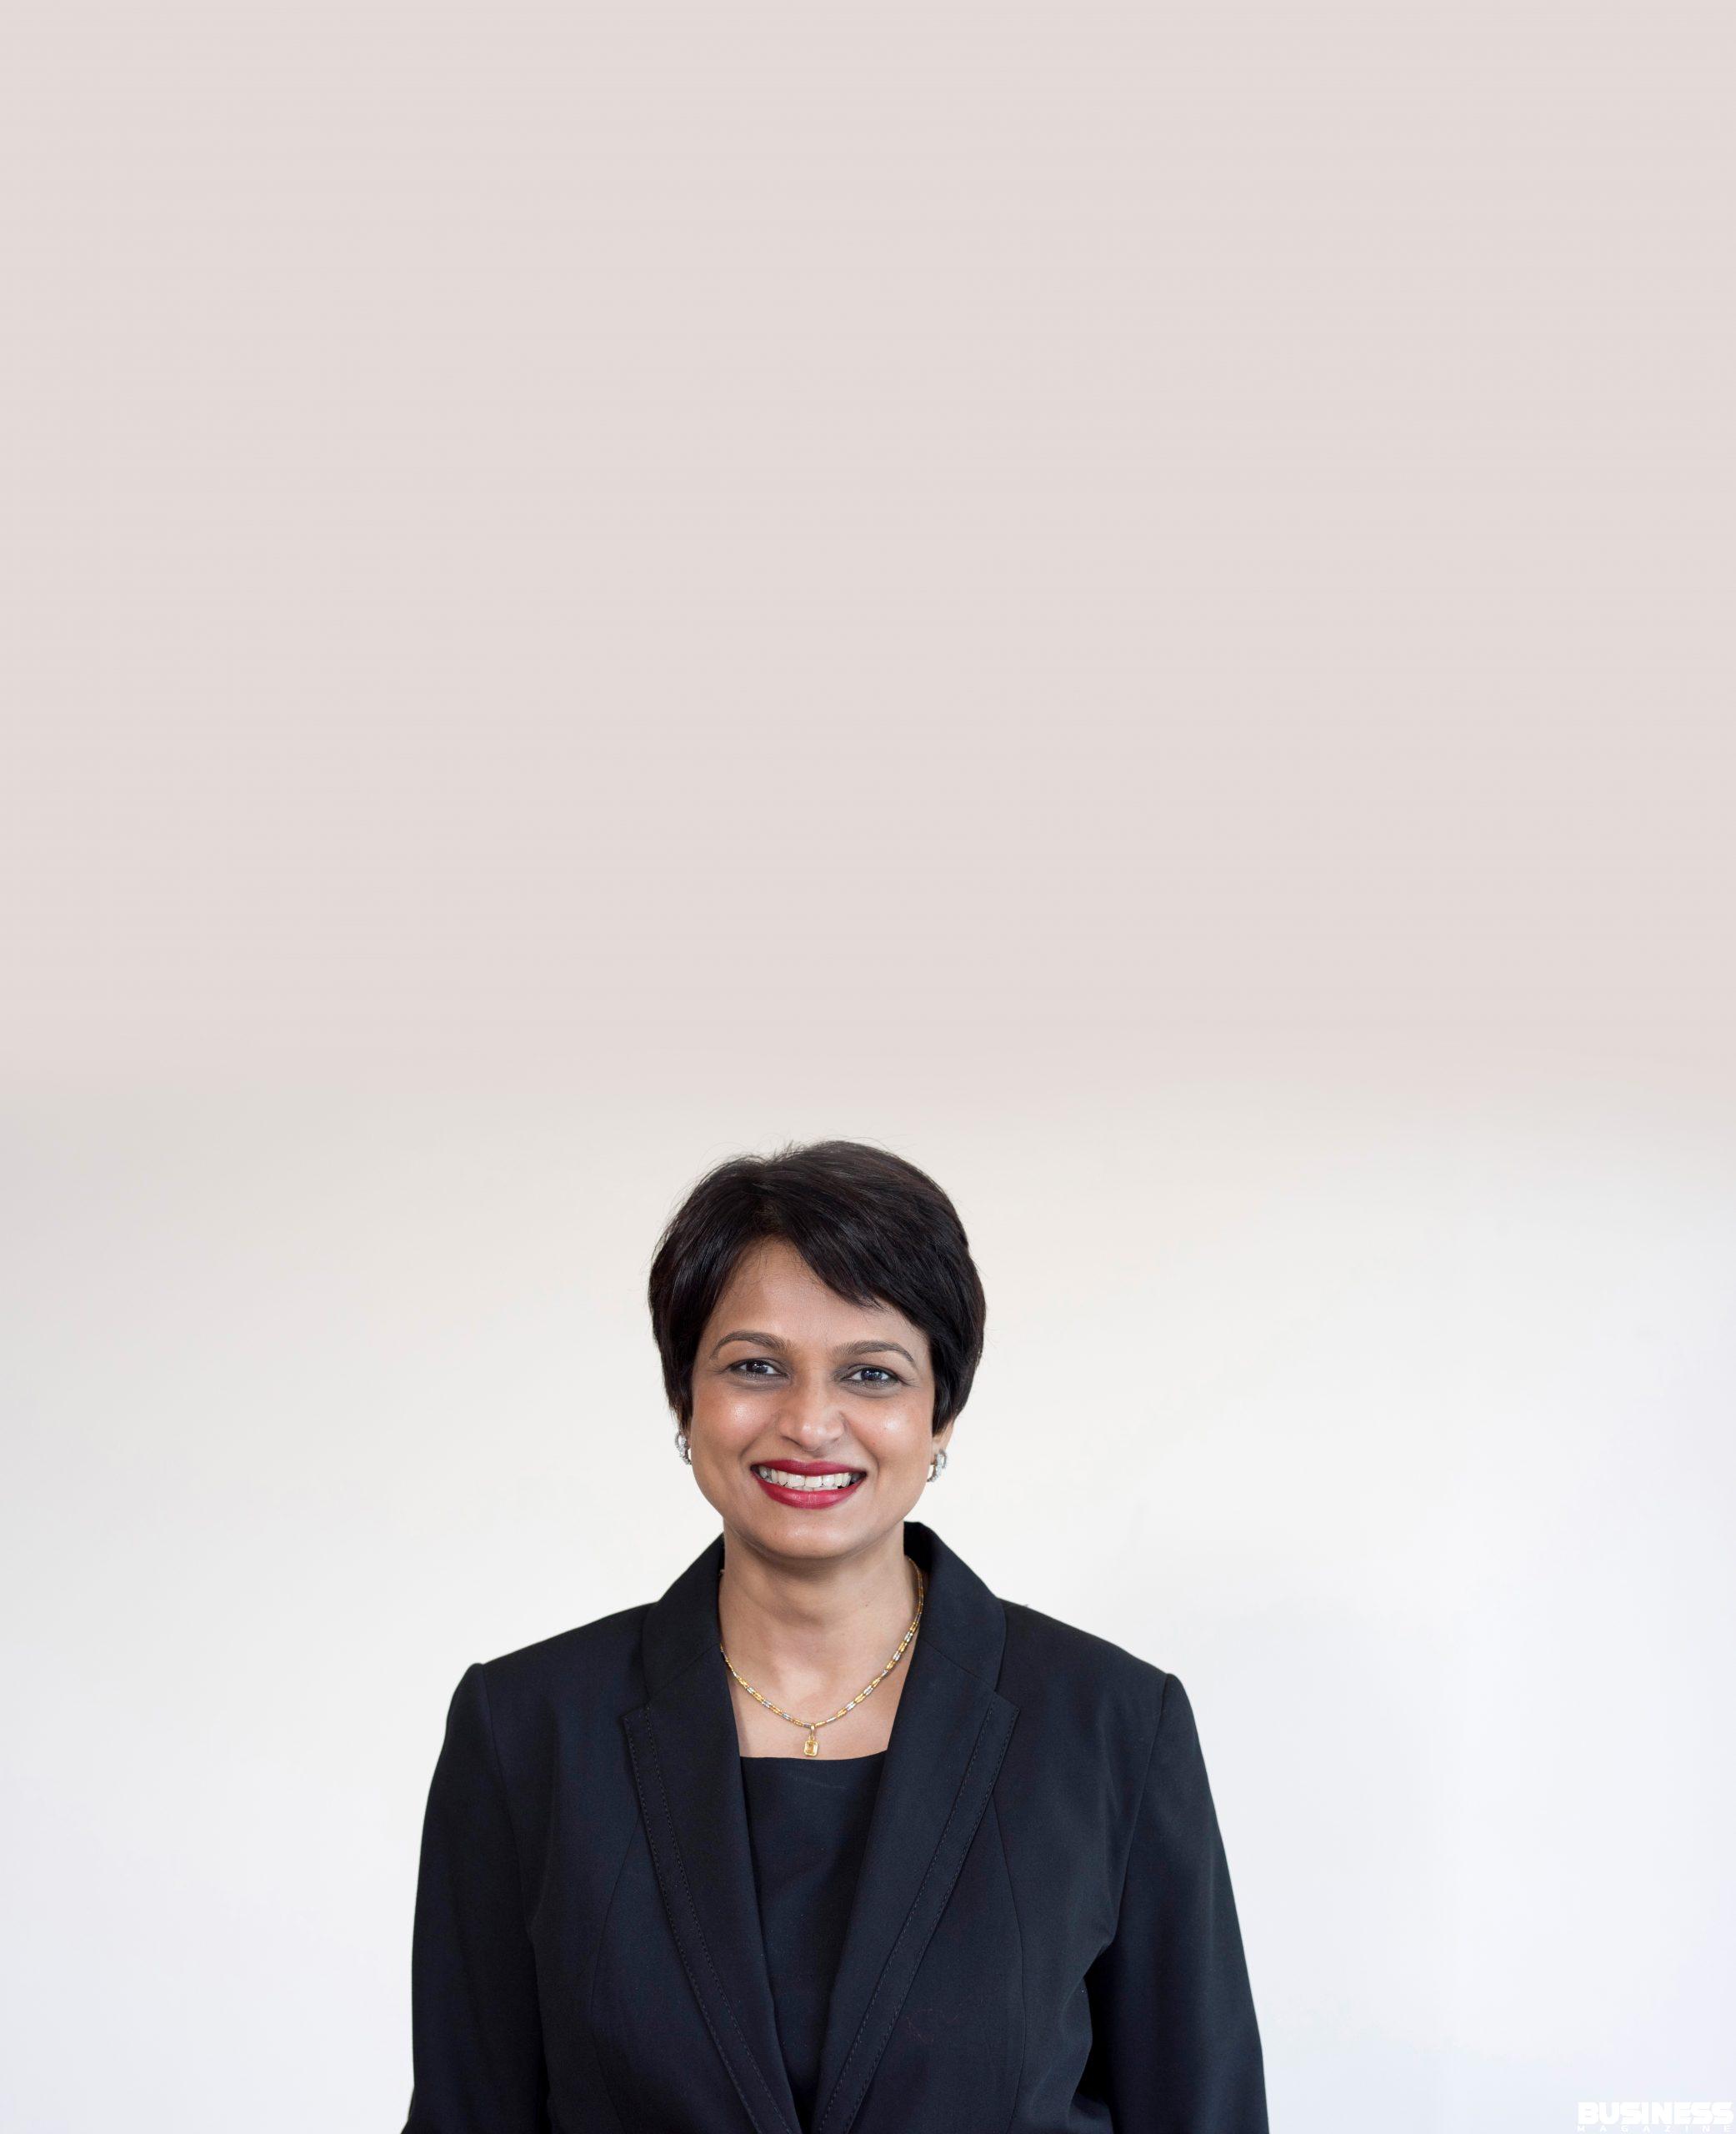 Le monde du travail - Sheila Ujoodha